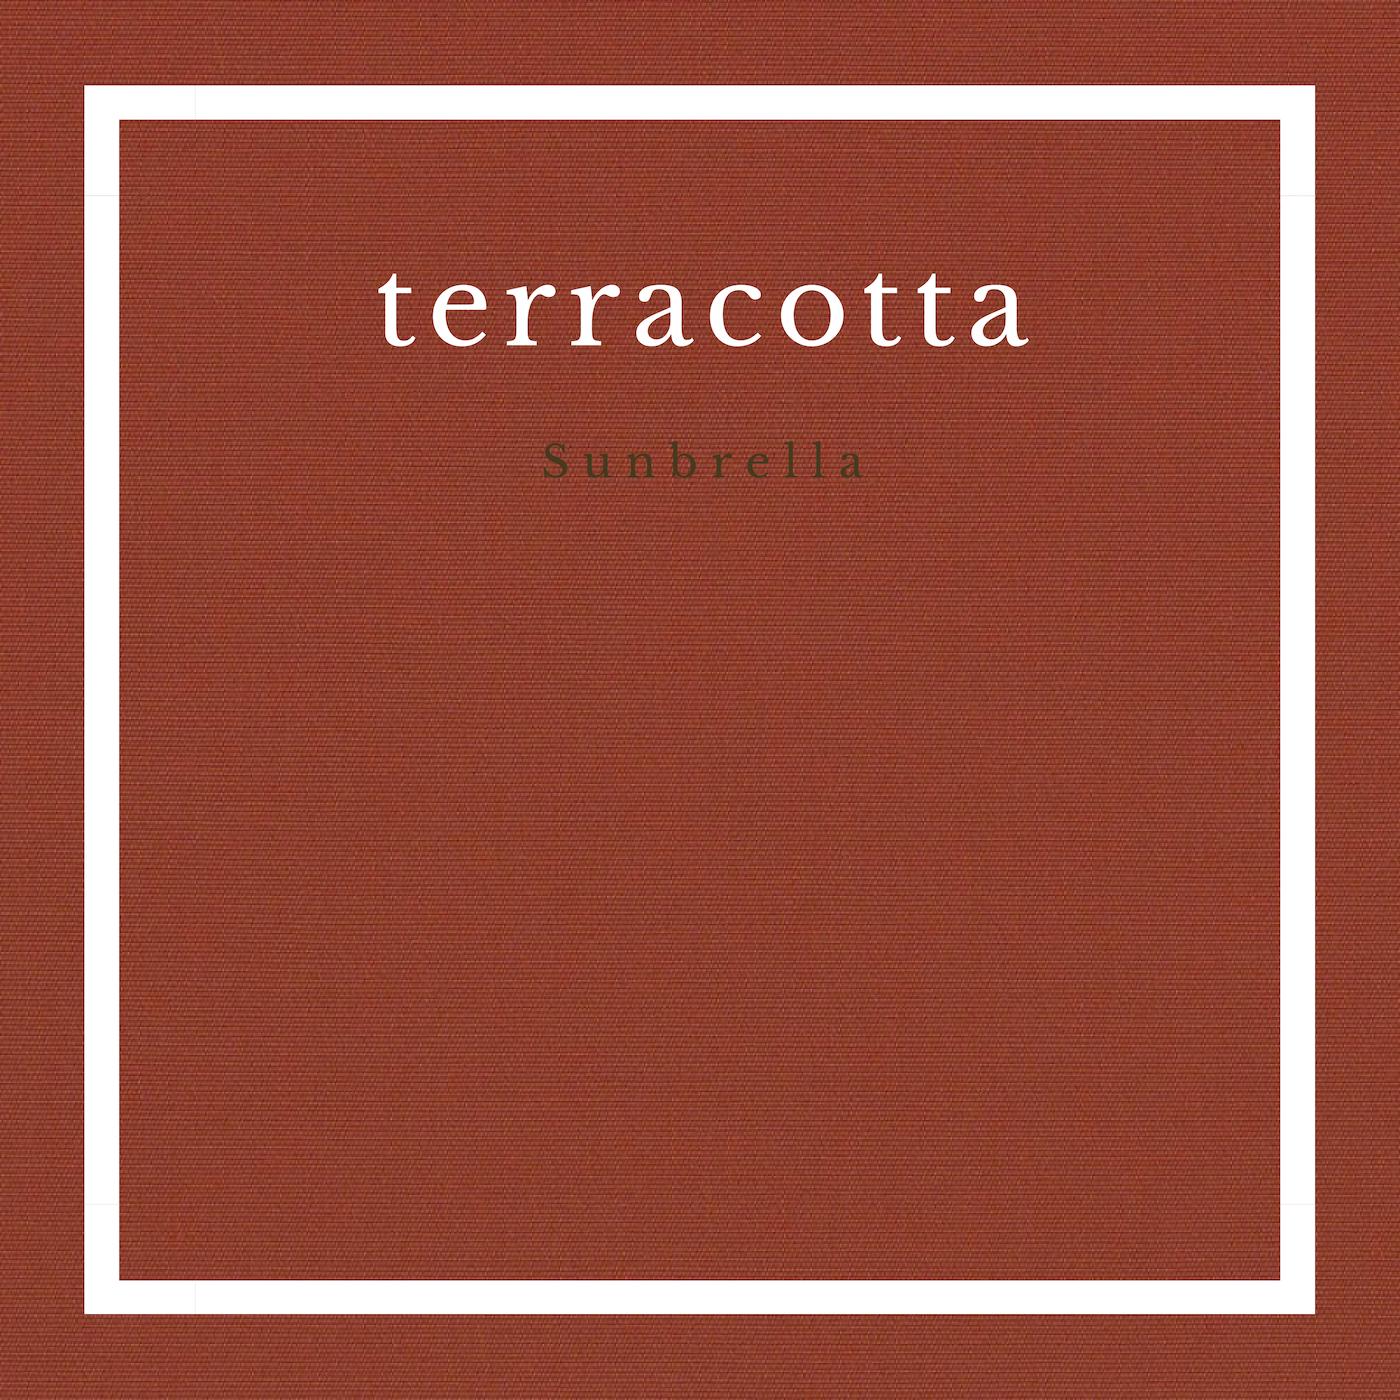 terracotta-sunbrella.jpg